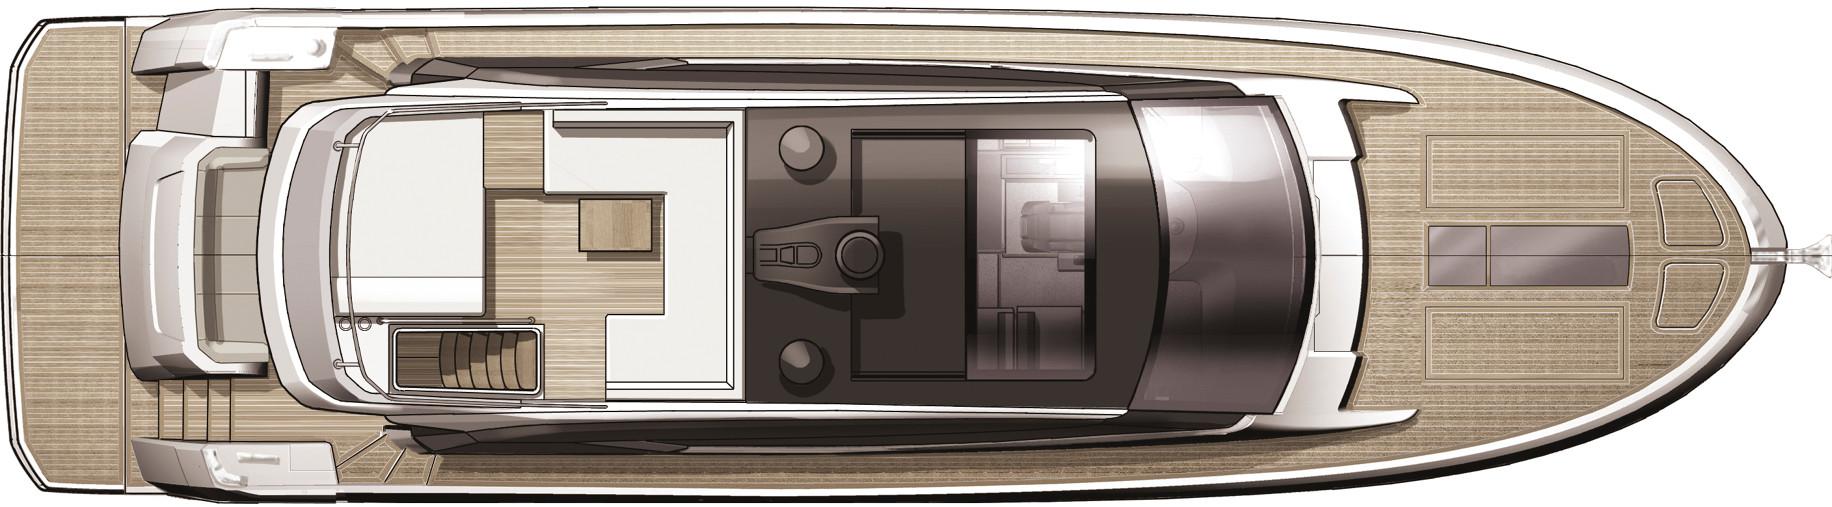 MC6 HardTop–topview 251112015.jpg 1832